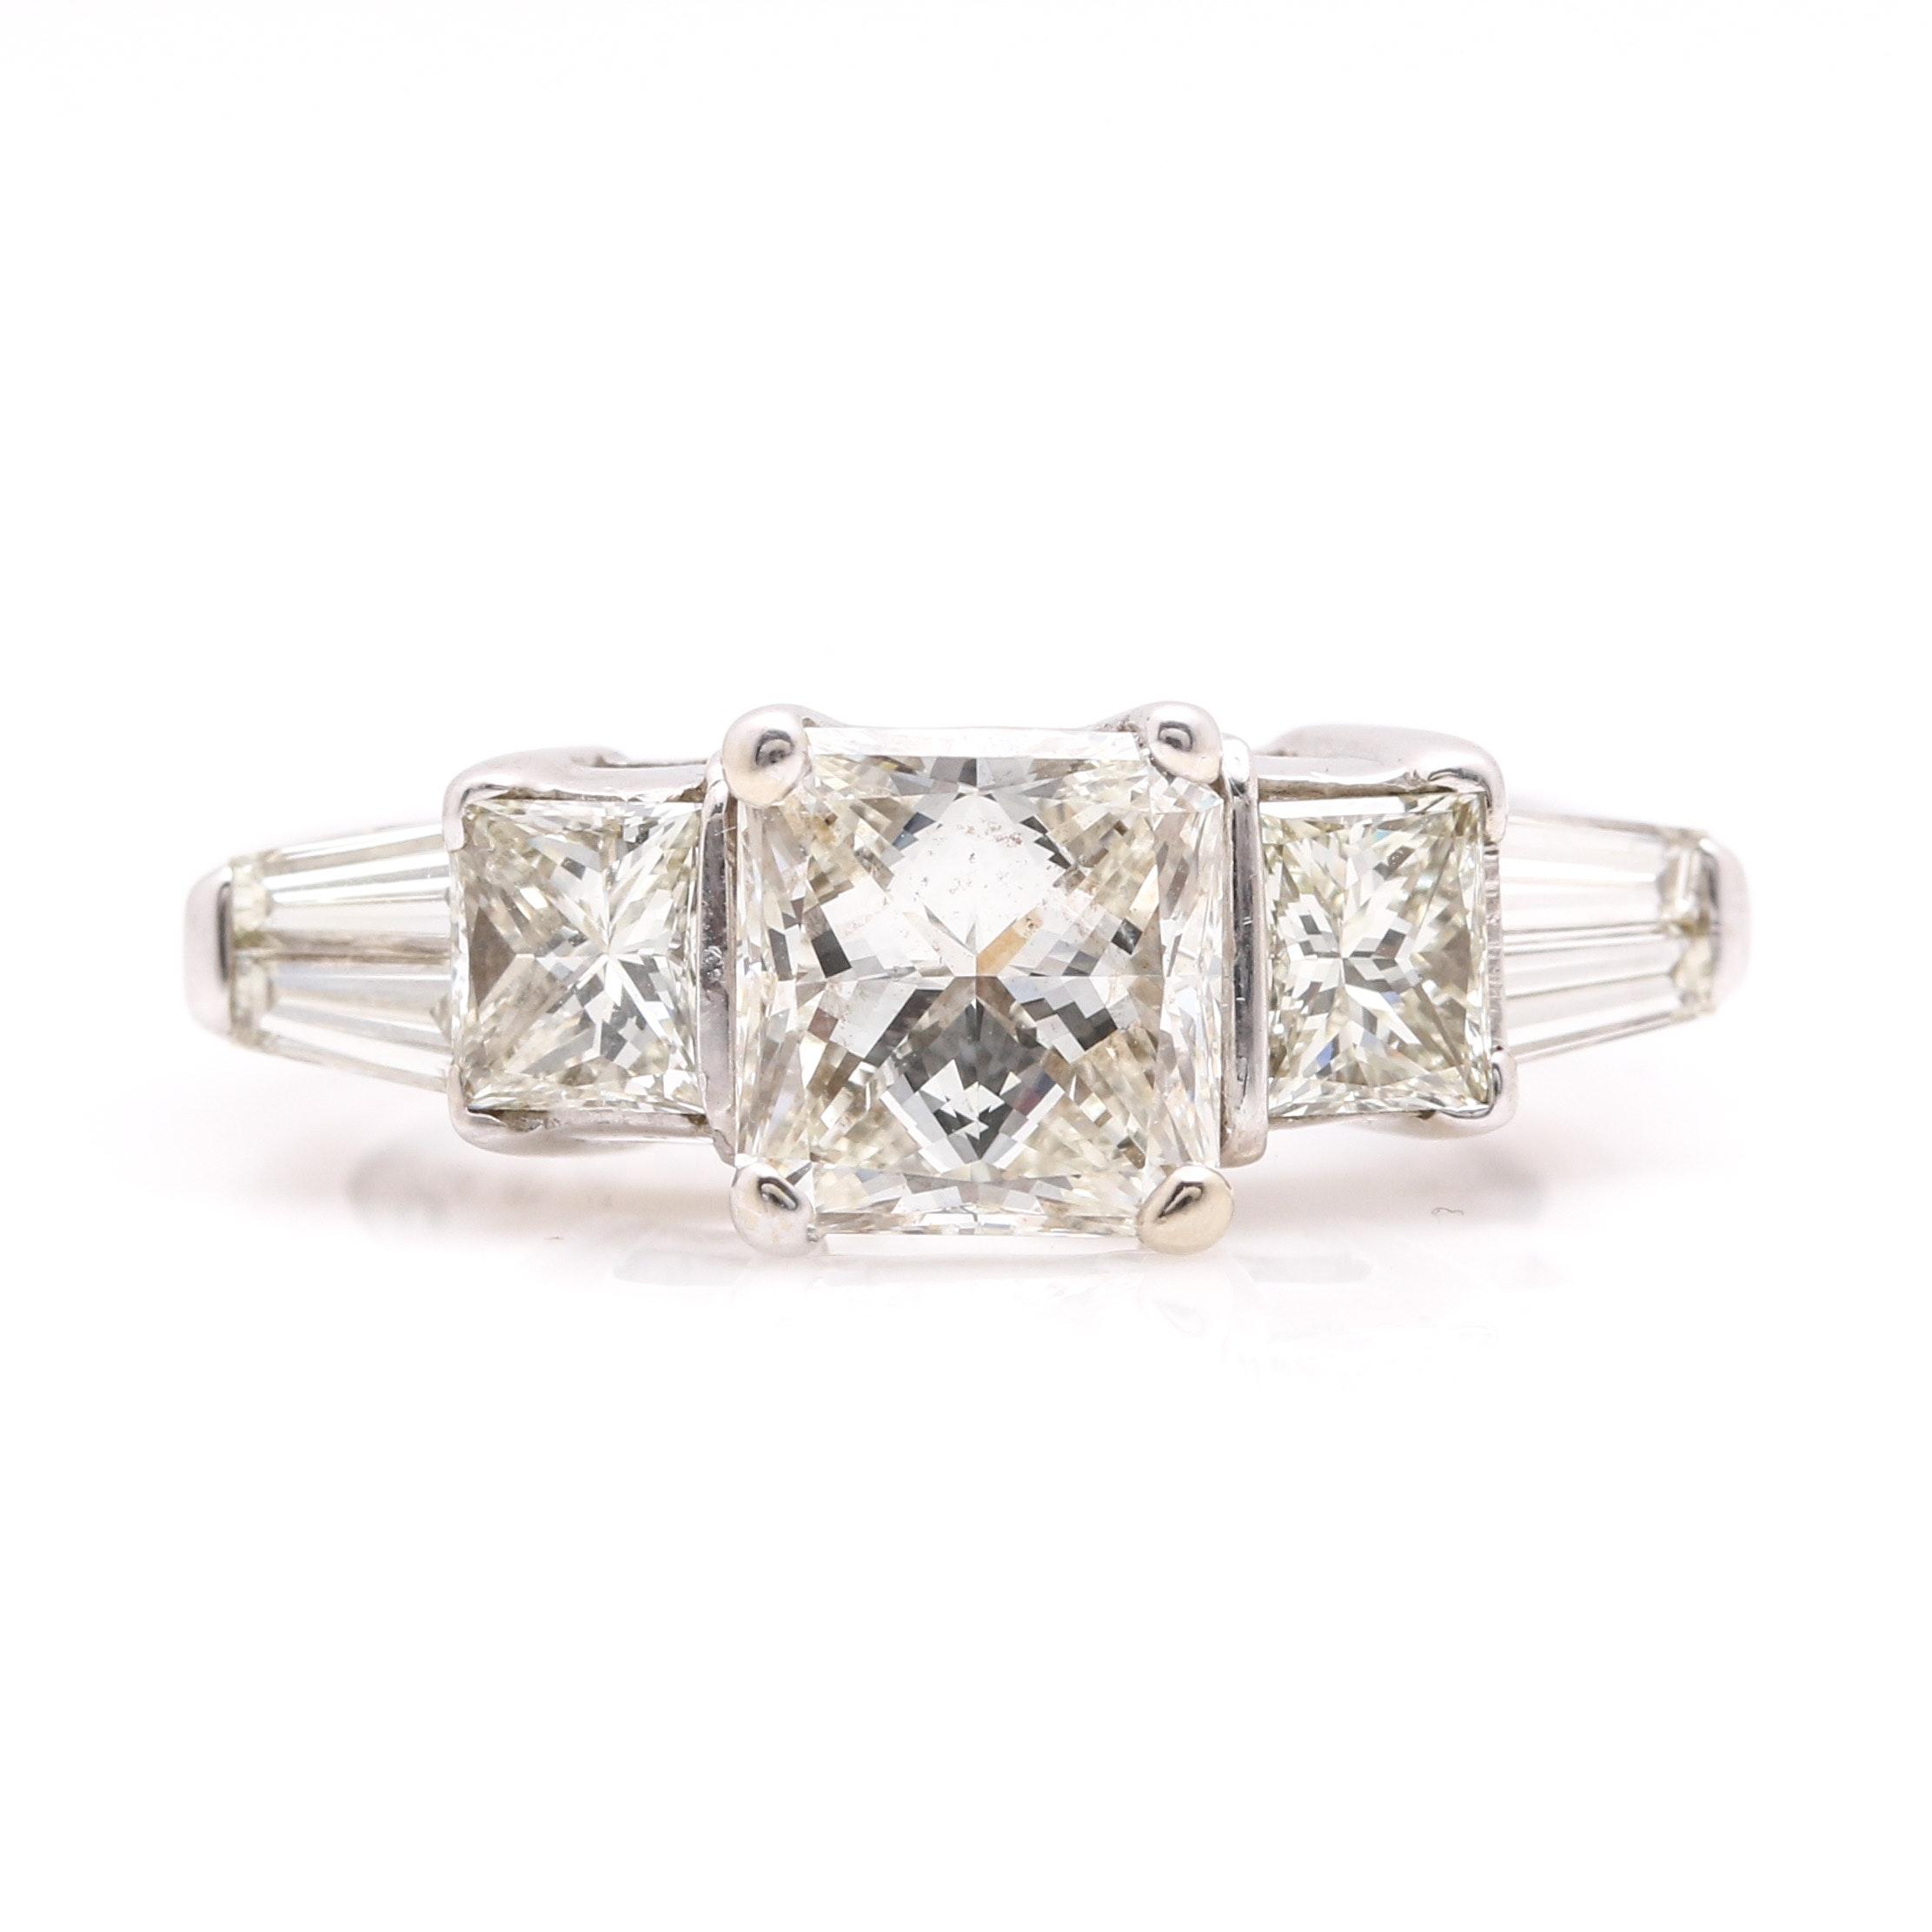 14K White Gold 3.72 CTW Diamond Ring